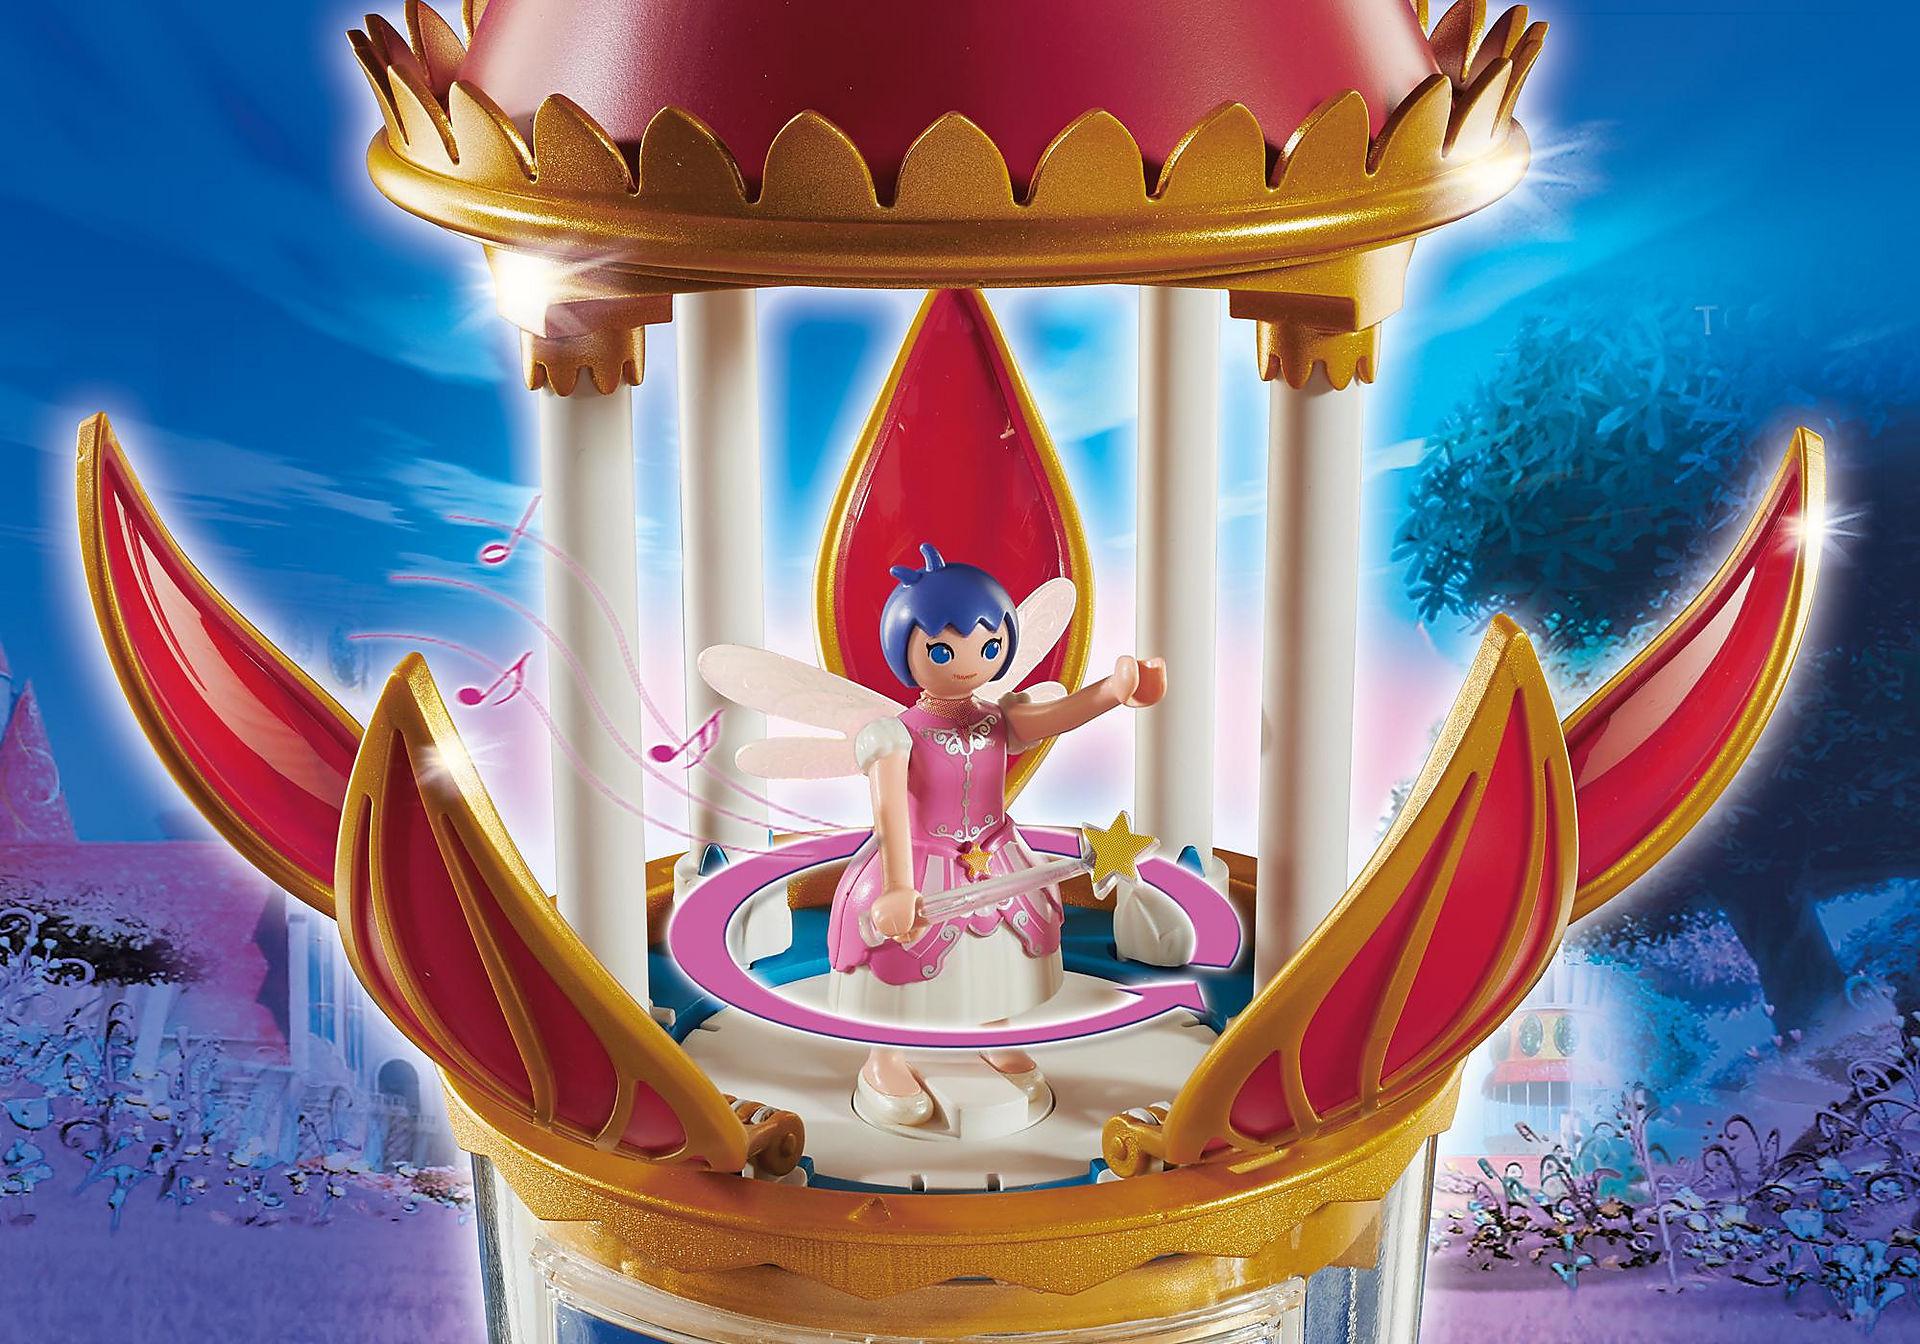 http://media.playmobil.com/i/playmobil/6688_product_extra1/Музыкальные Цветочная Башня с Твинкл